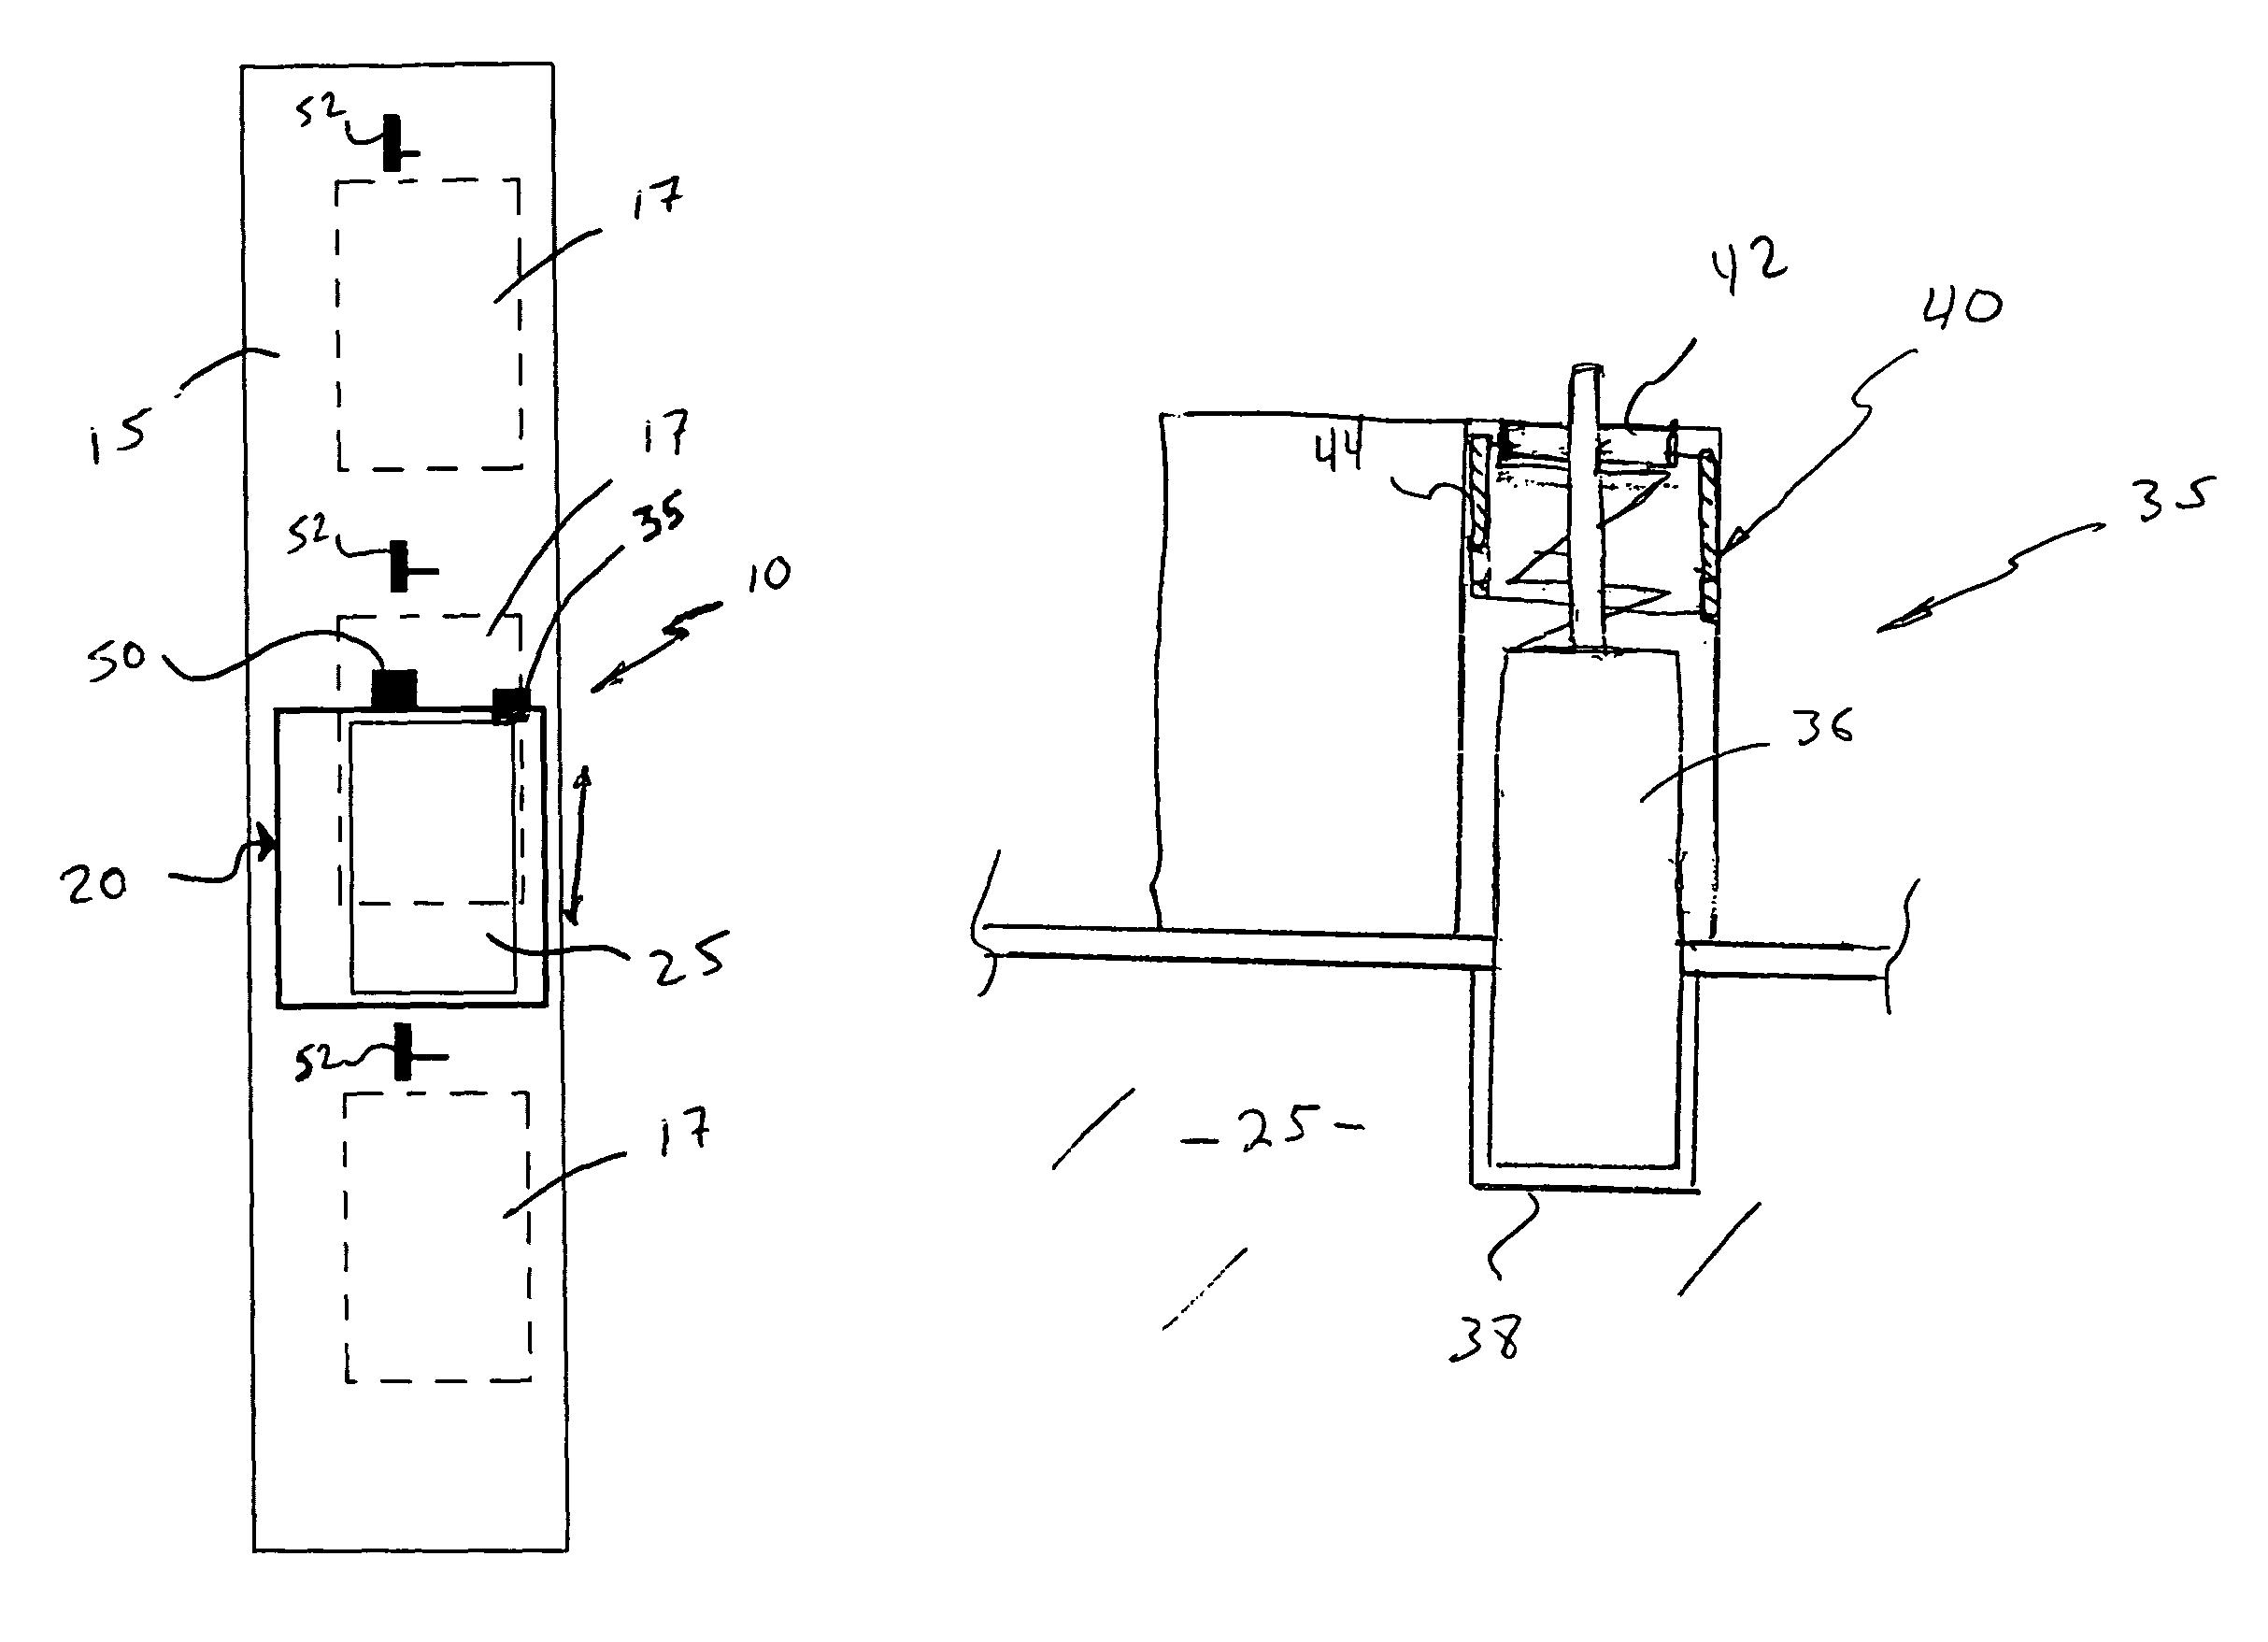 Otis Elevator Wiring Diagram Free Picture Wiring Diagram Schematic